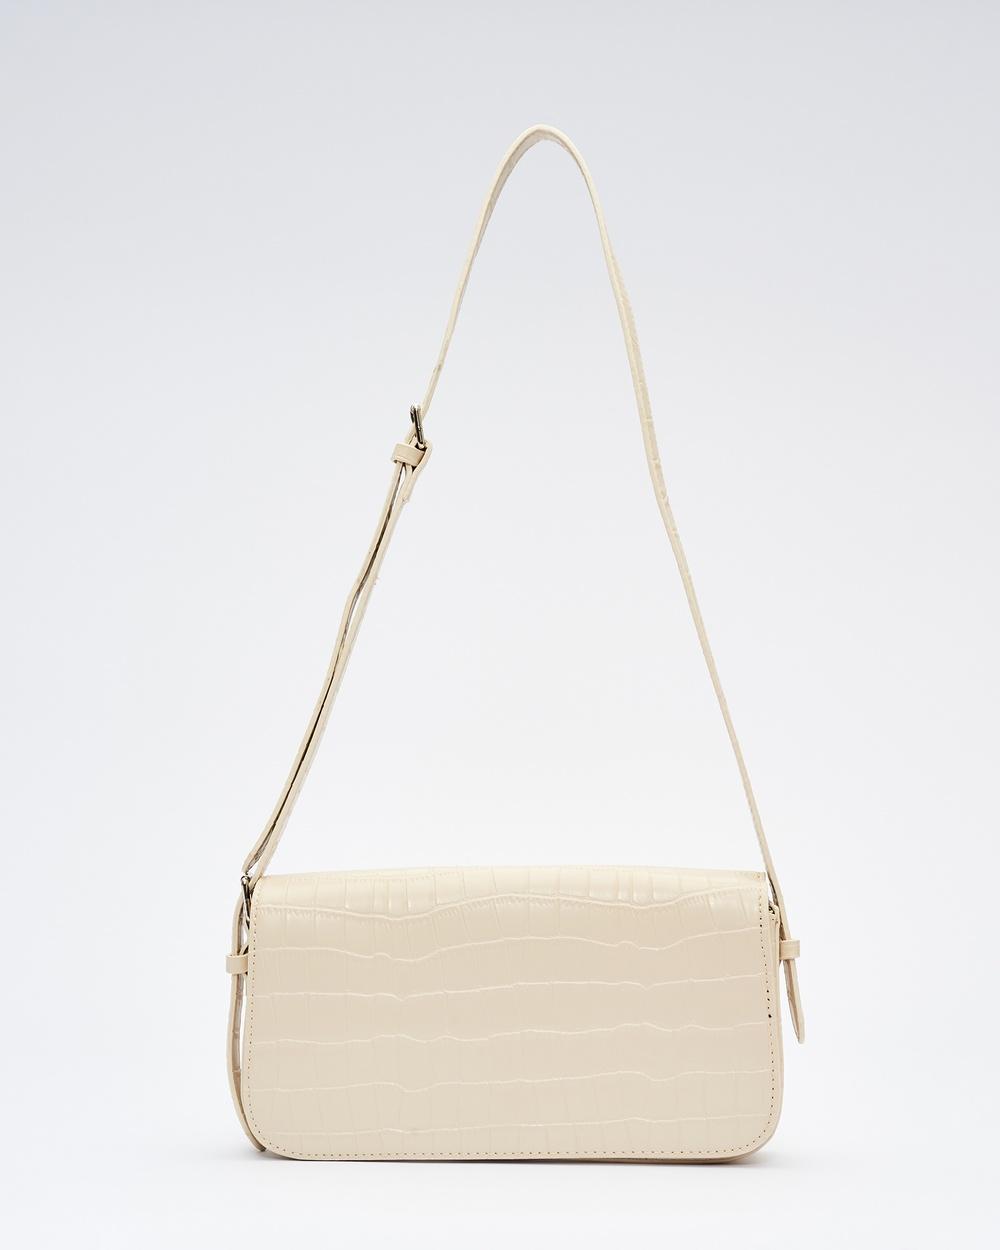 Calli Emra Bag Handbags Beige Handbags Australia